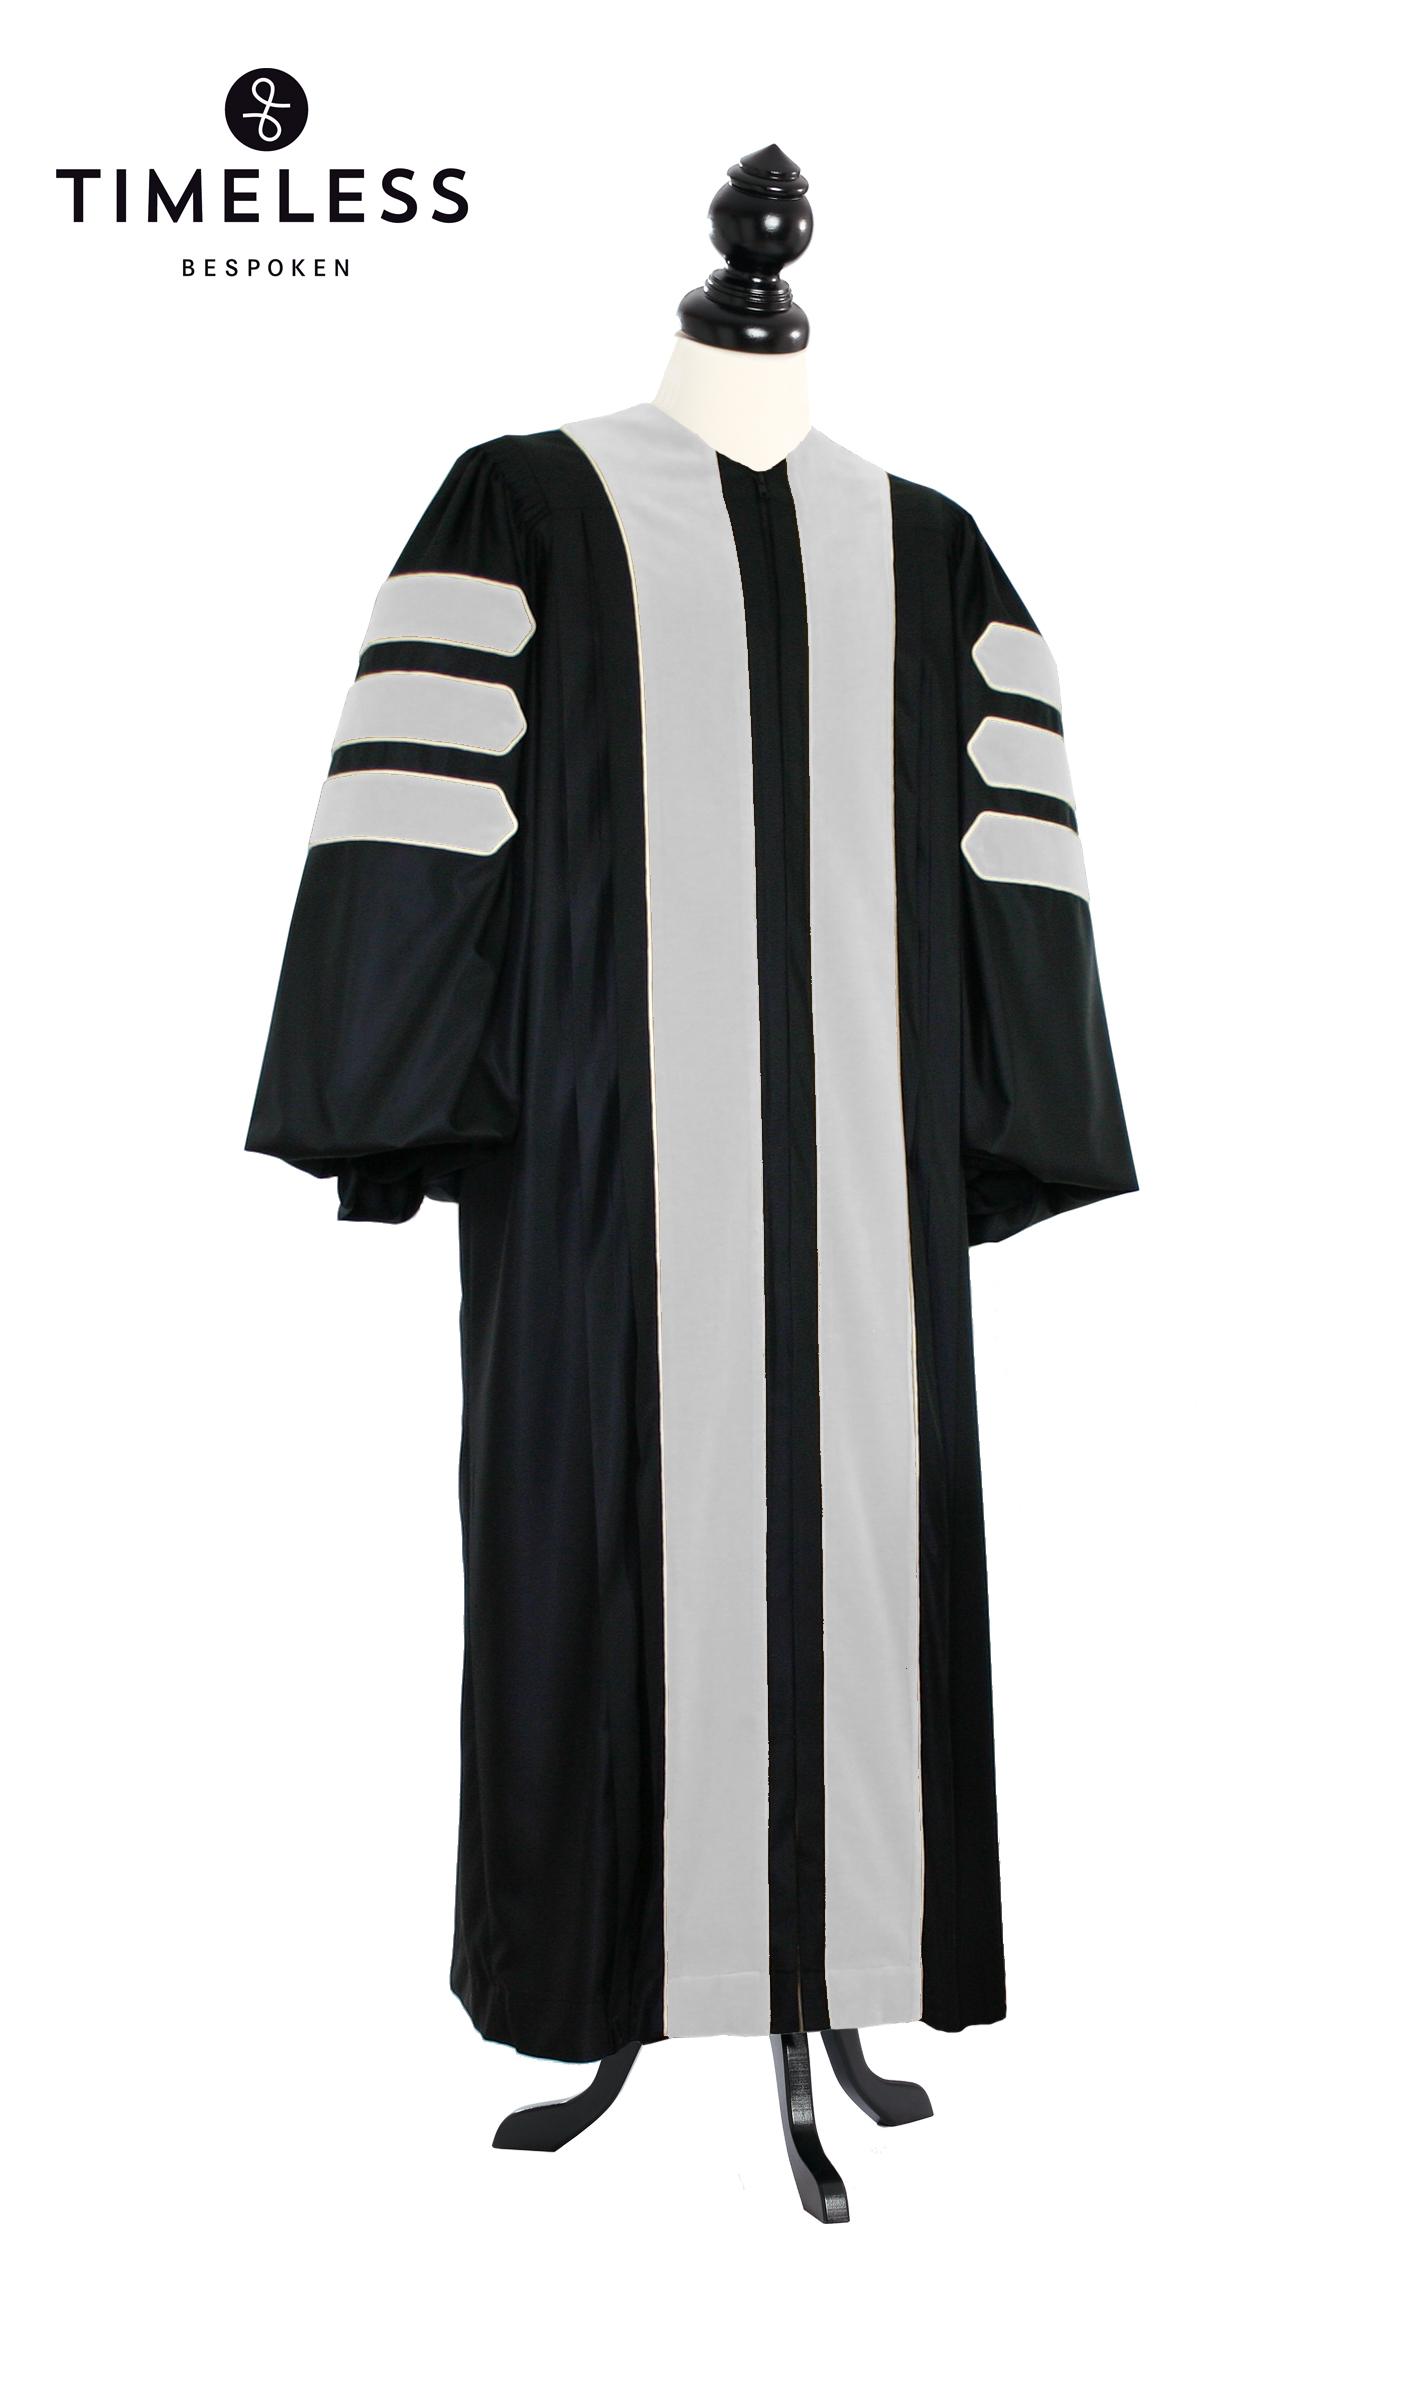 Doktortalar Kunst und Geisteswissenschaften, TIMELESS silver wool